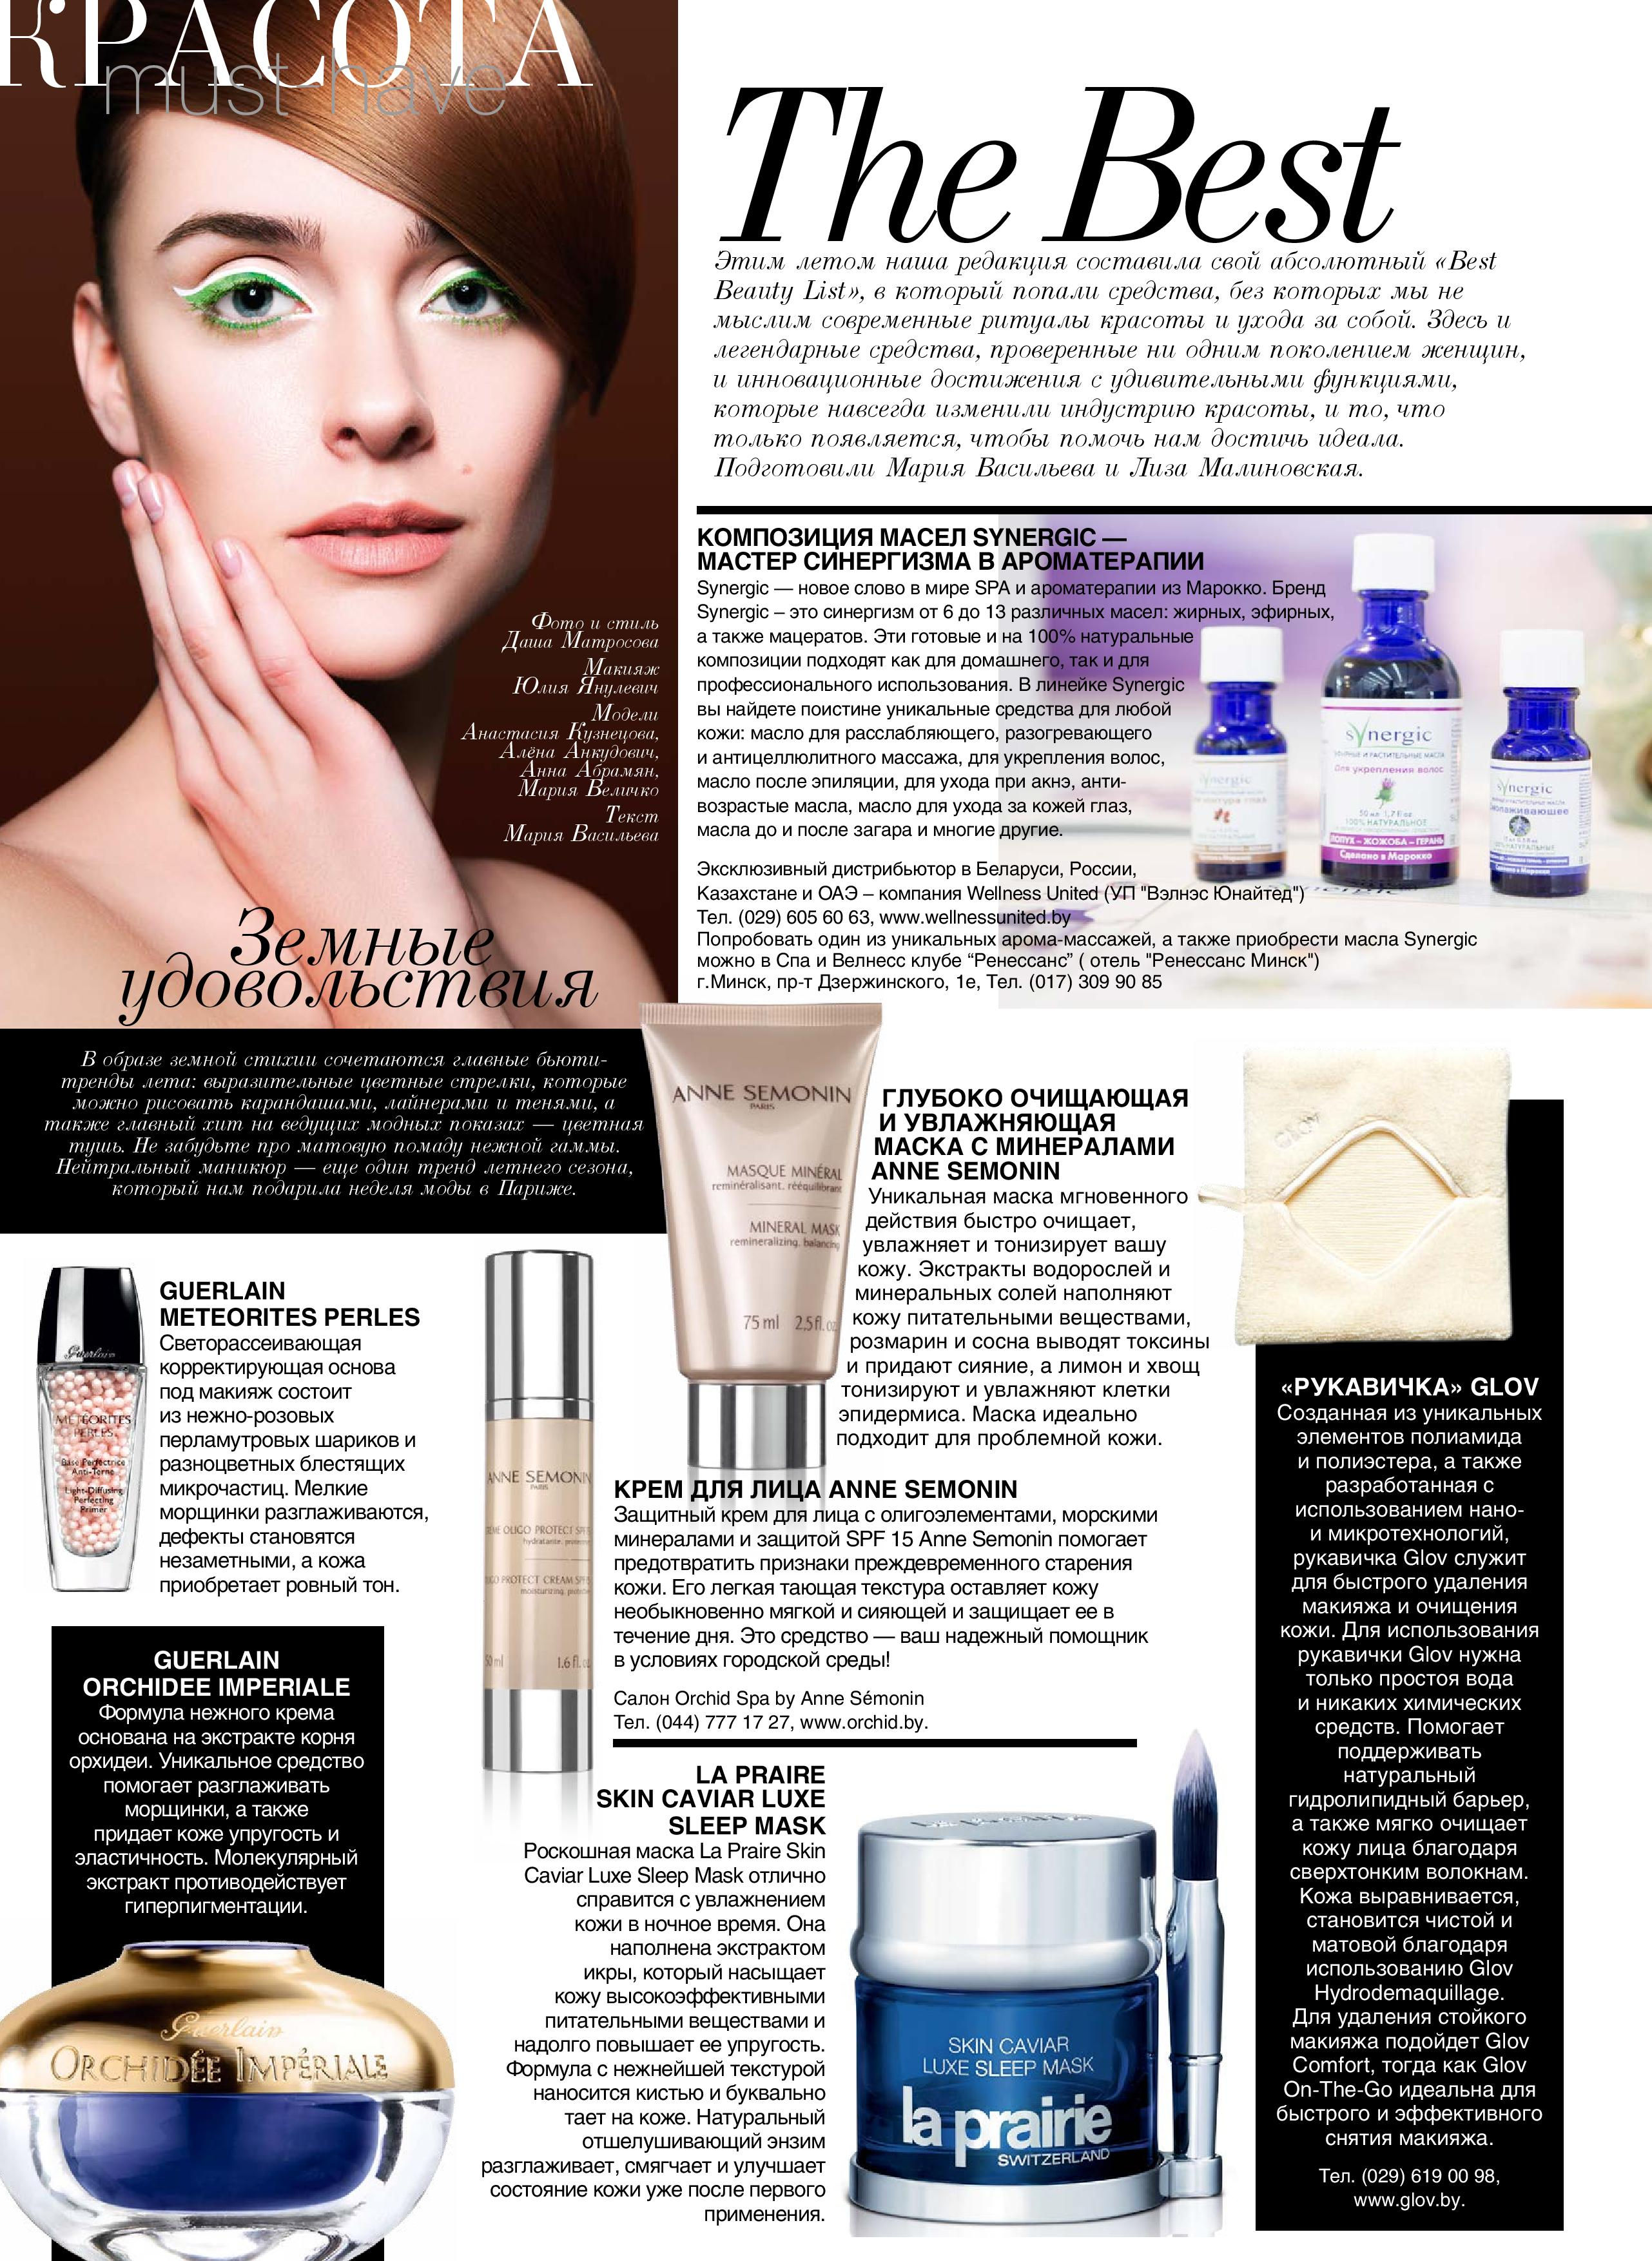 ЭШ№50 The best косметика парфюмерия-page-002